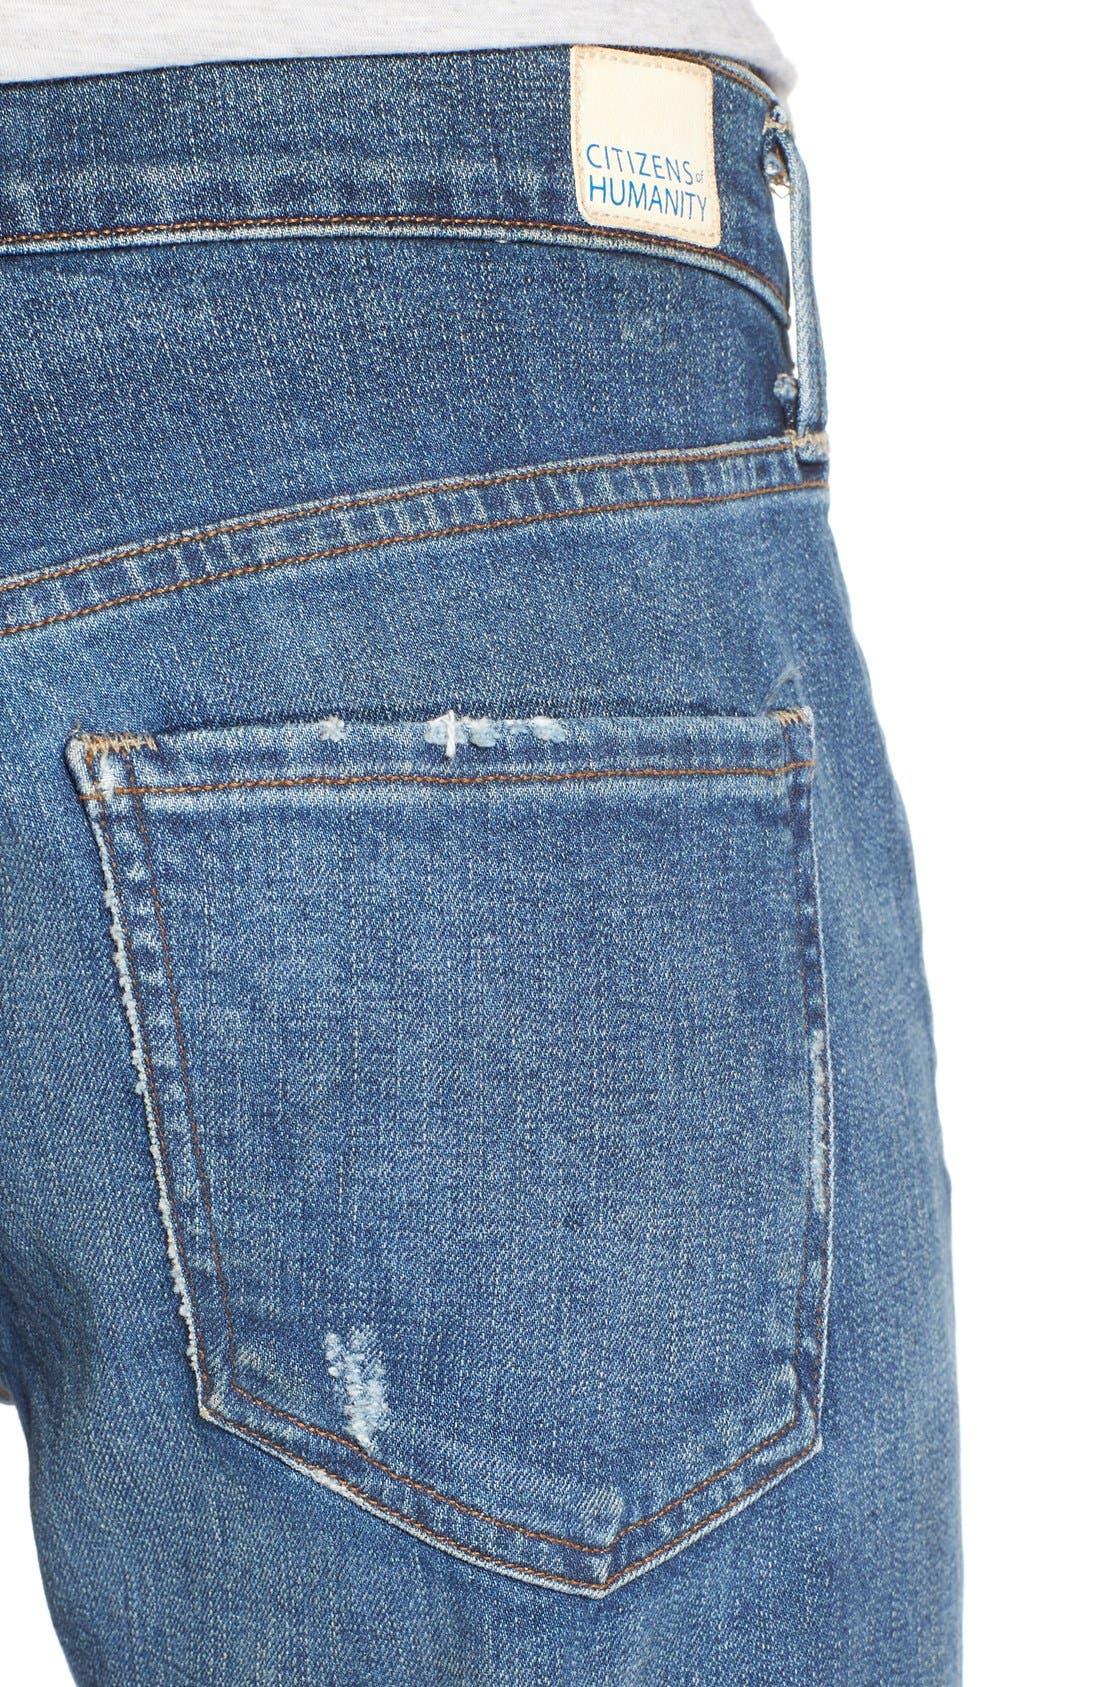 'Emerson Long' Slim Boyfriend Jeans,                             Alternate thumbnail 4, color,                             Blue Mountain